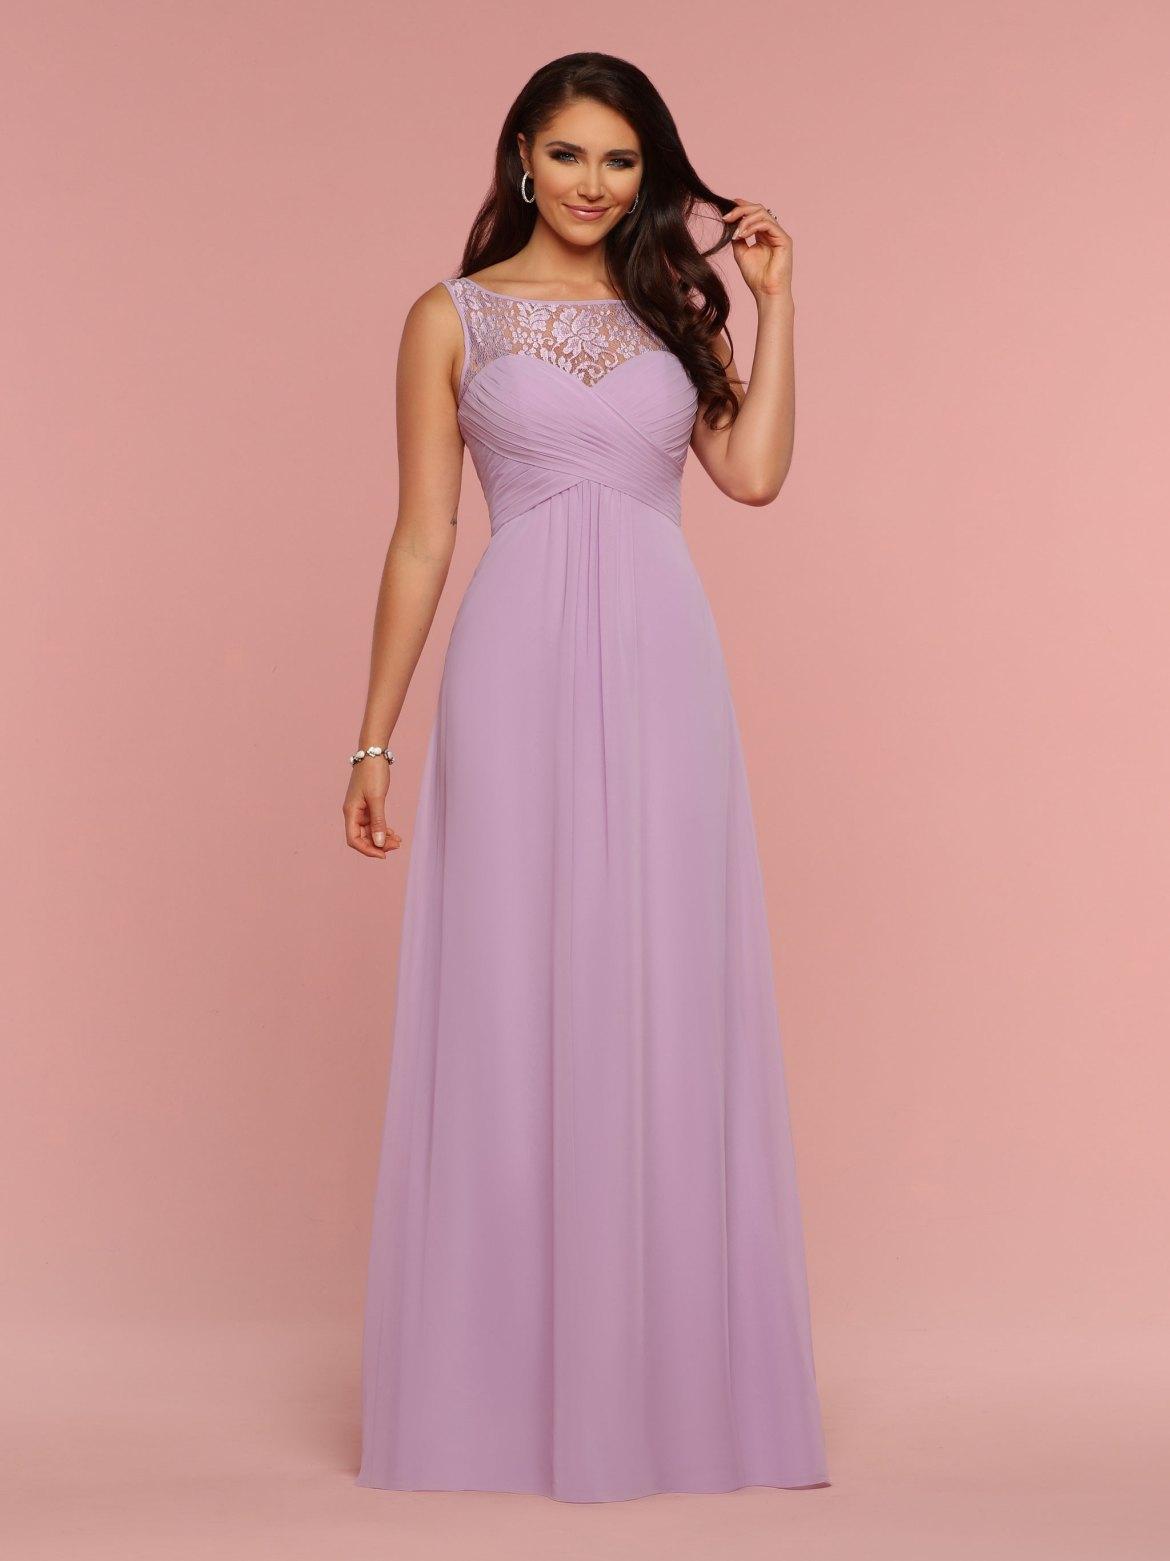 DaVinci Bridesmaids Style #60332 - Front View